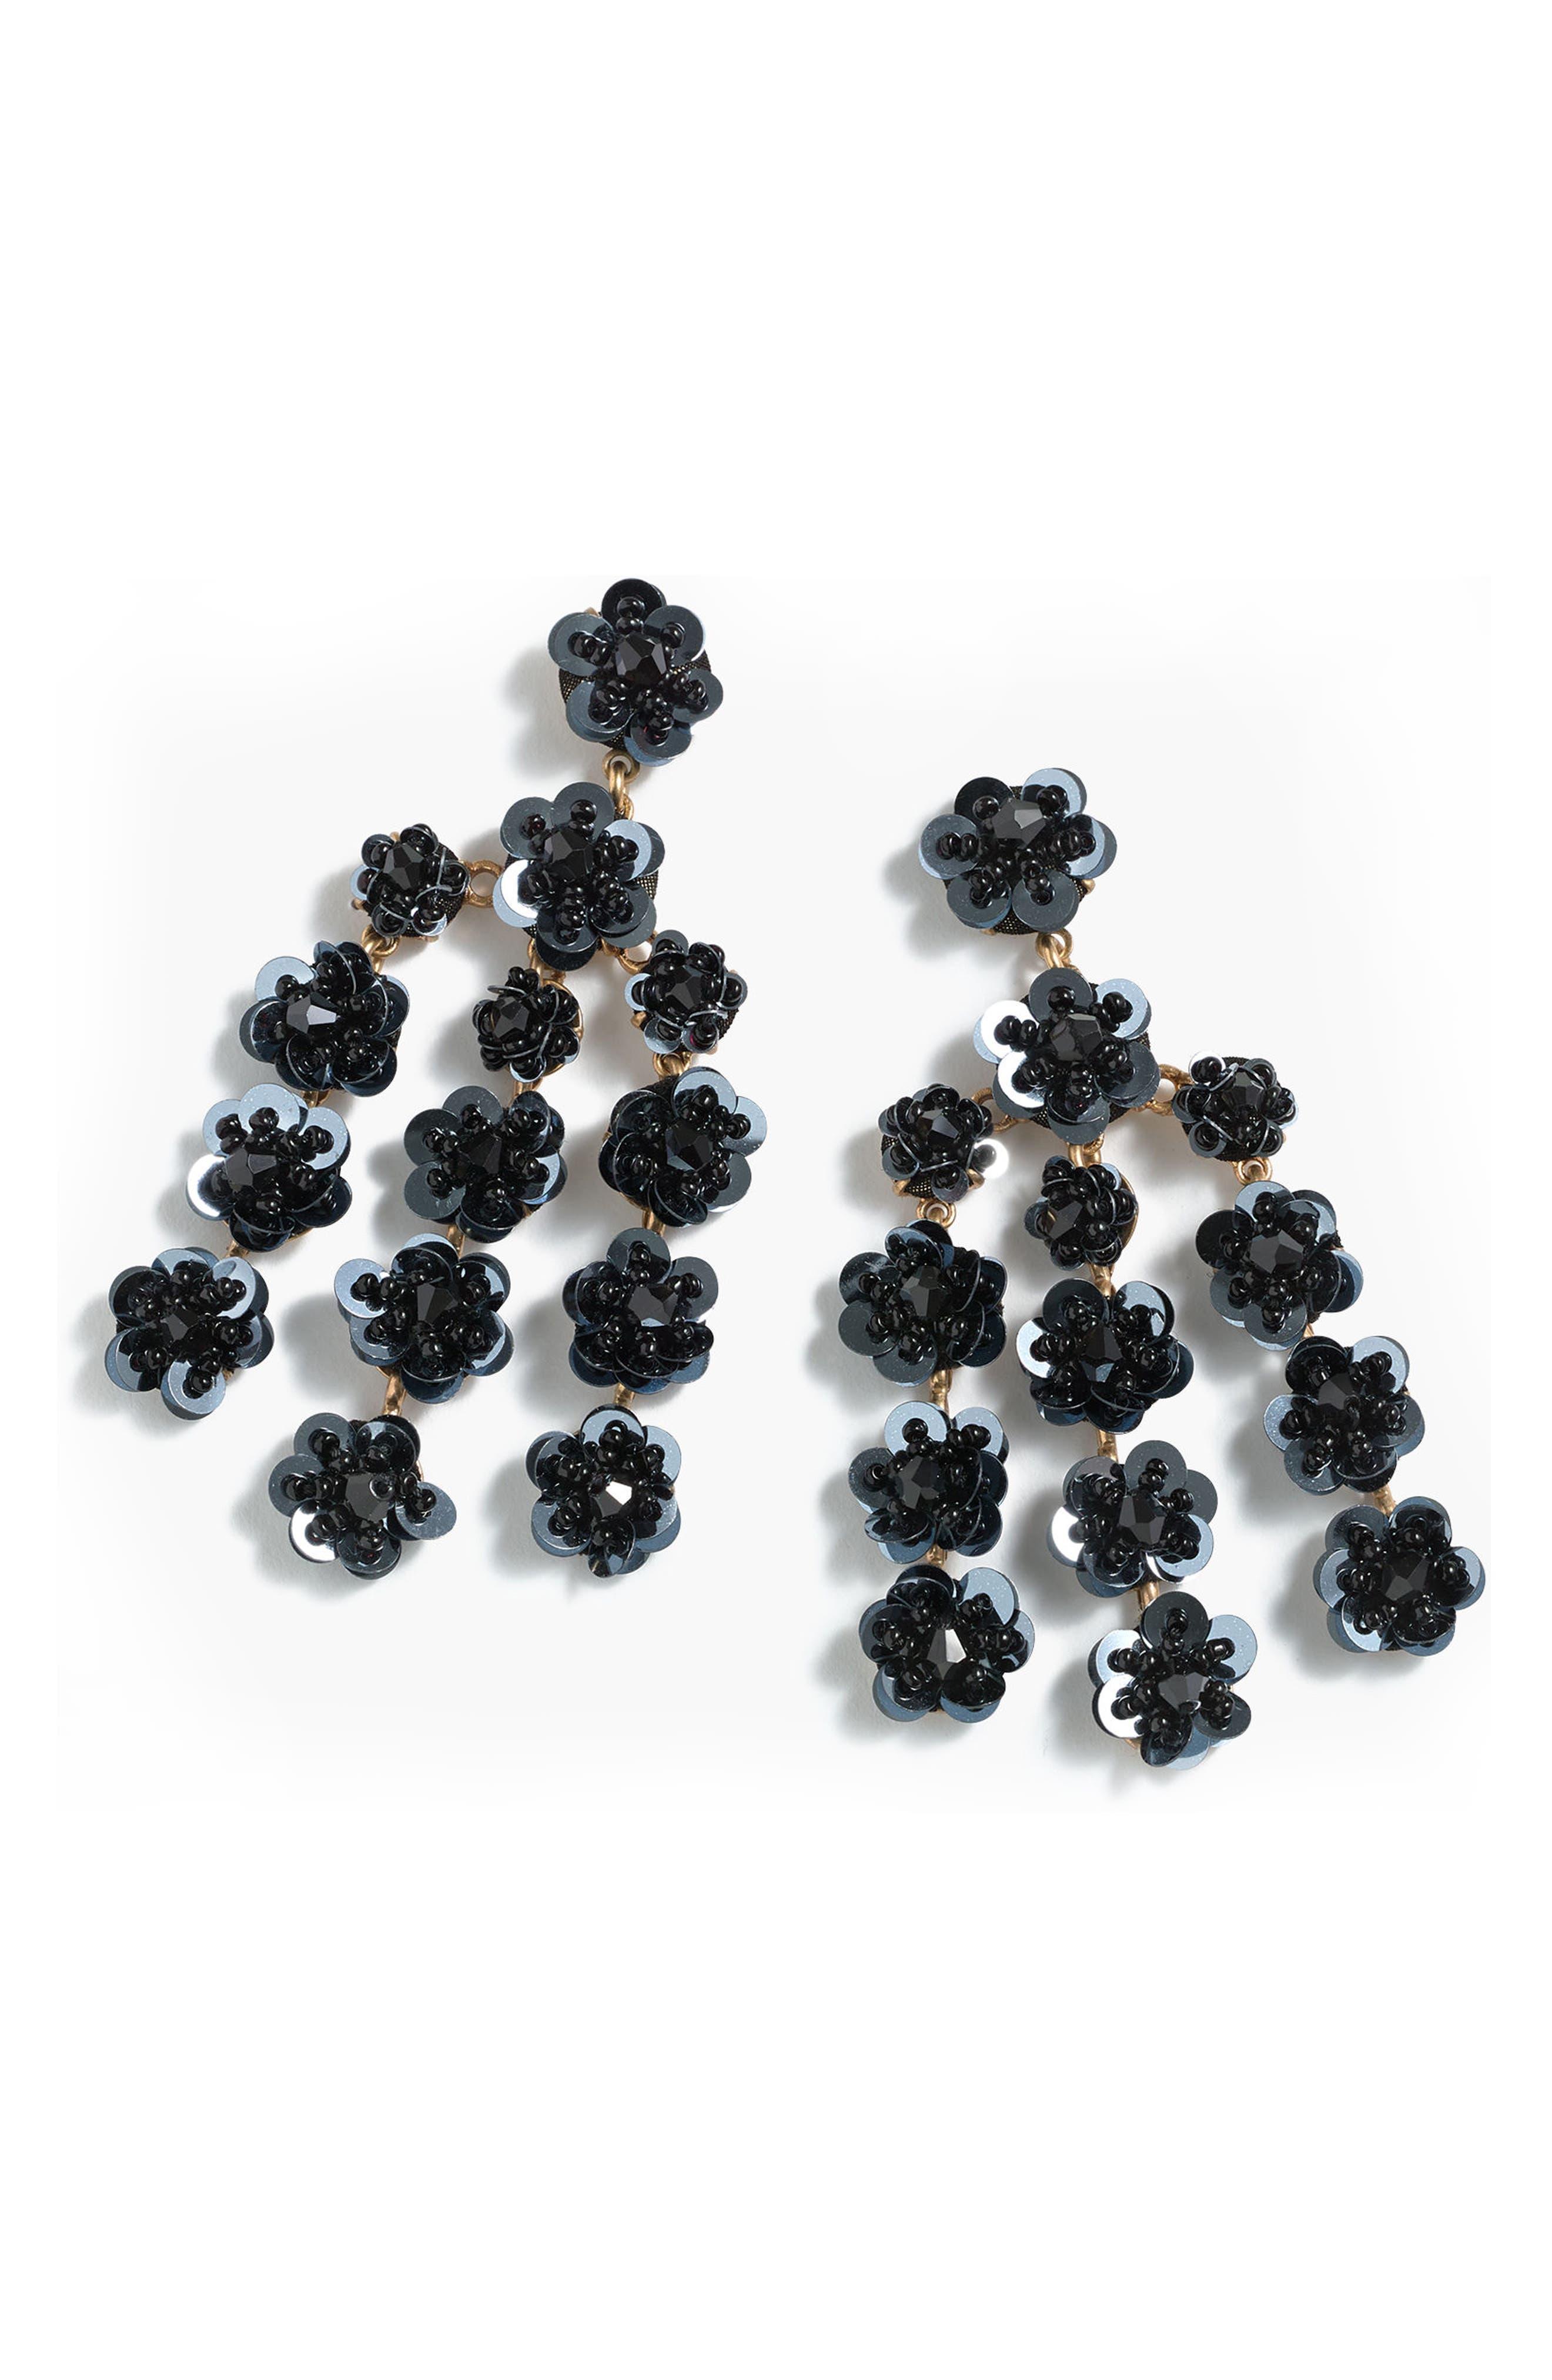 Sequin Daisy Chandelier Earrings,                             Main thumbnail 1, color,                             Black